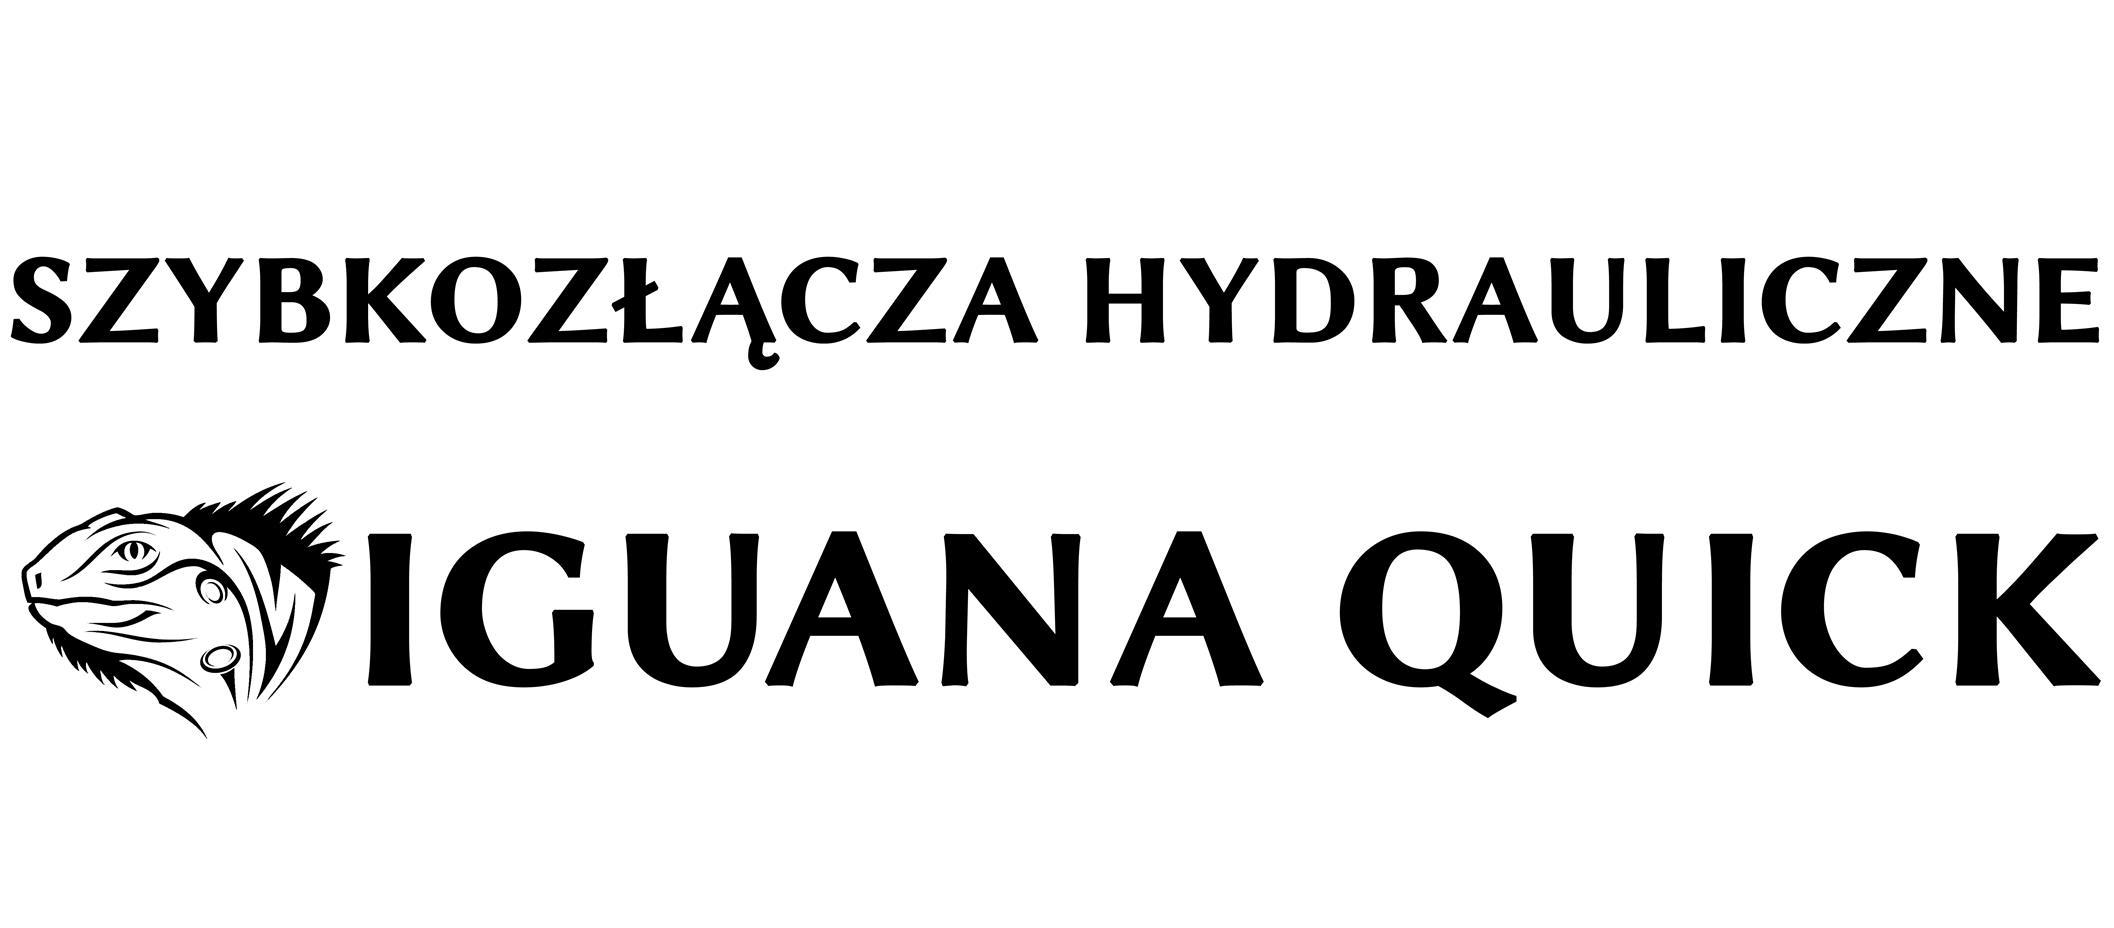 IGUANA_QUICK_baner.jpg